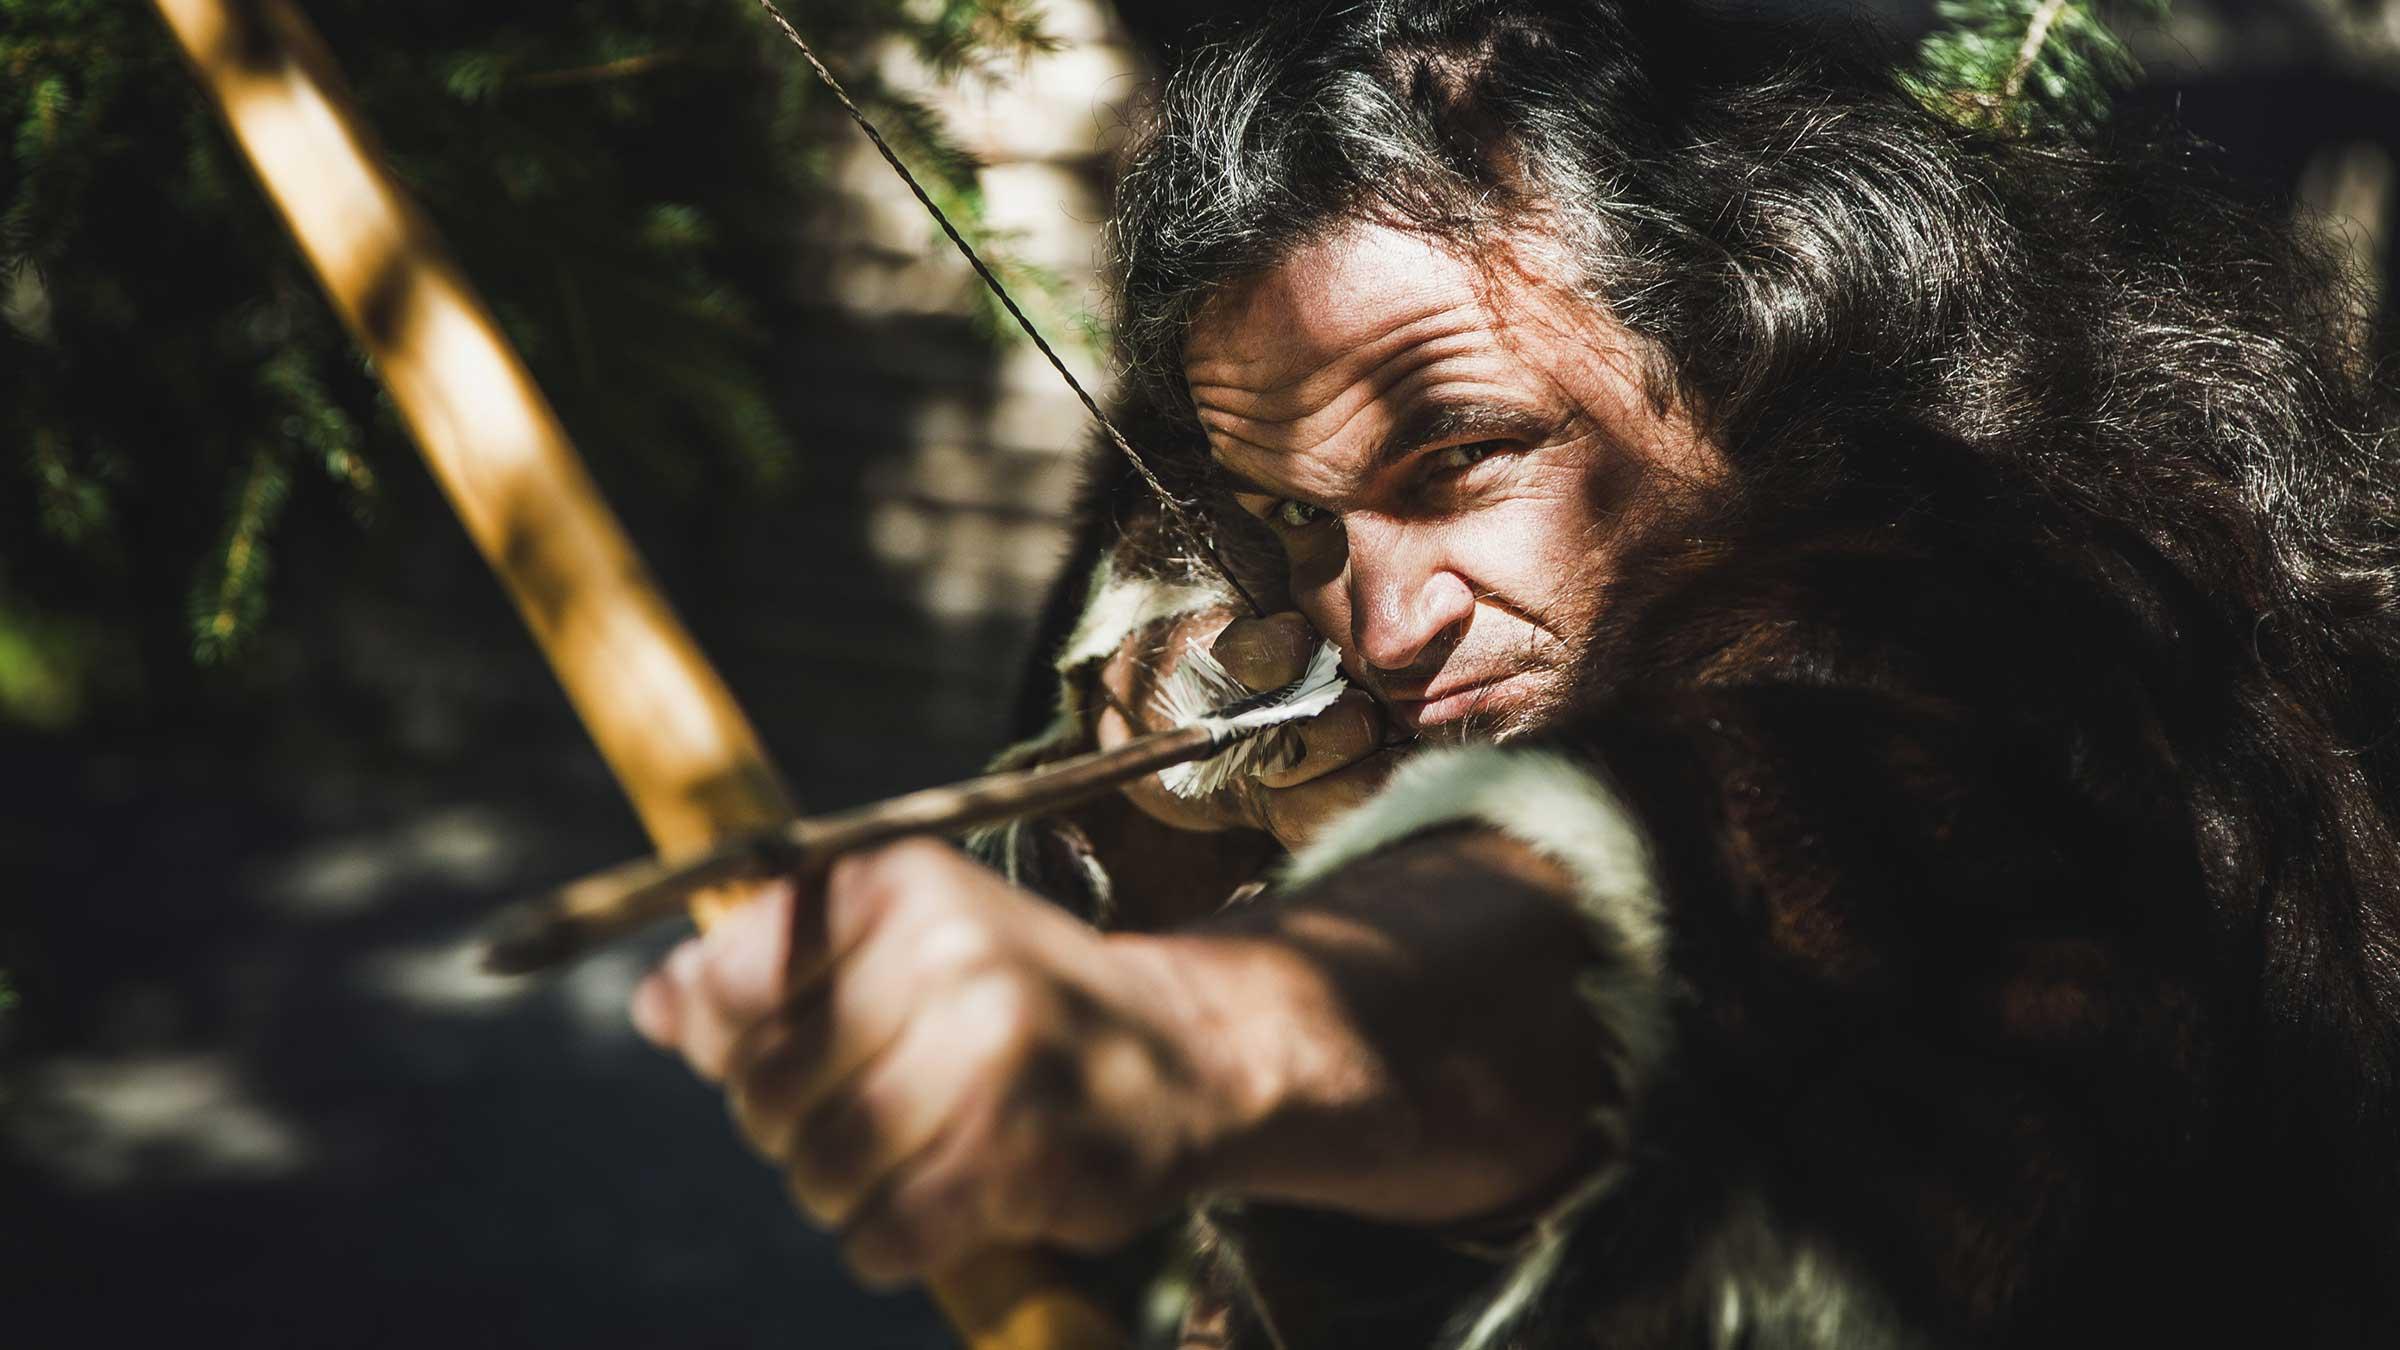 Ötzi mit Pfeil und Bogen - Kriminalall Ötzi